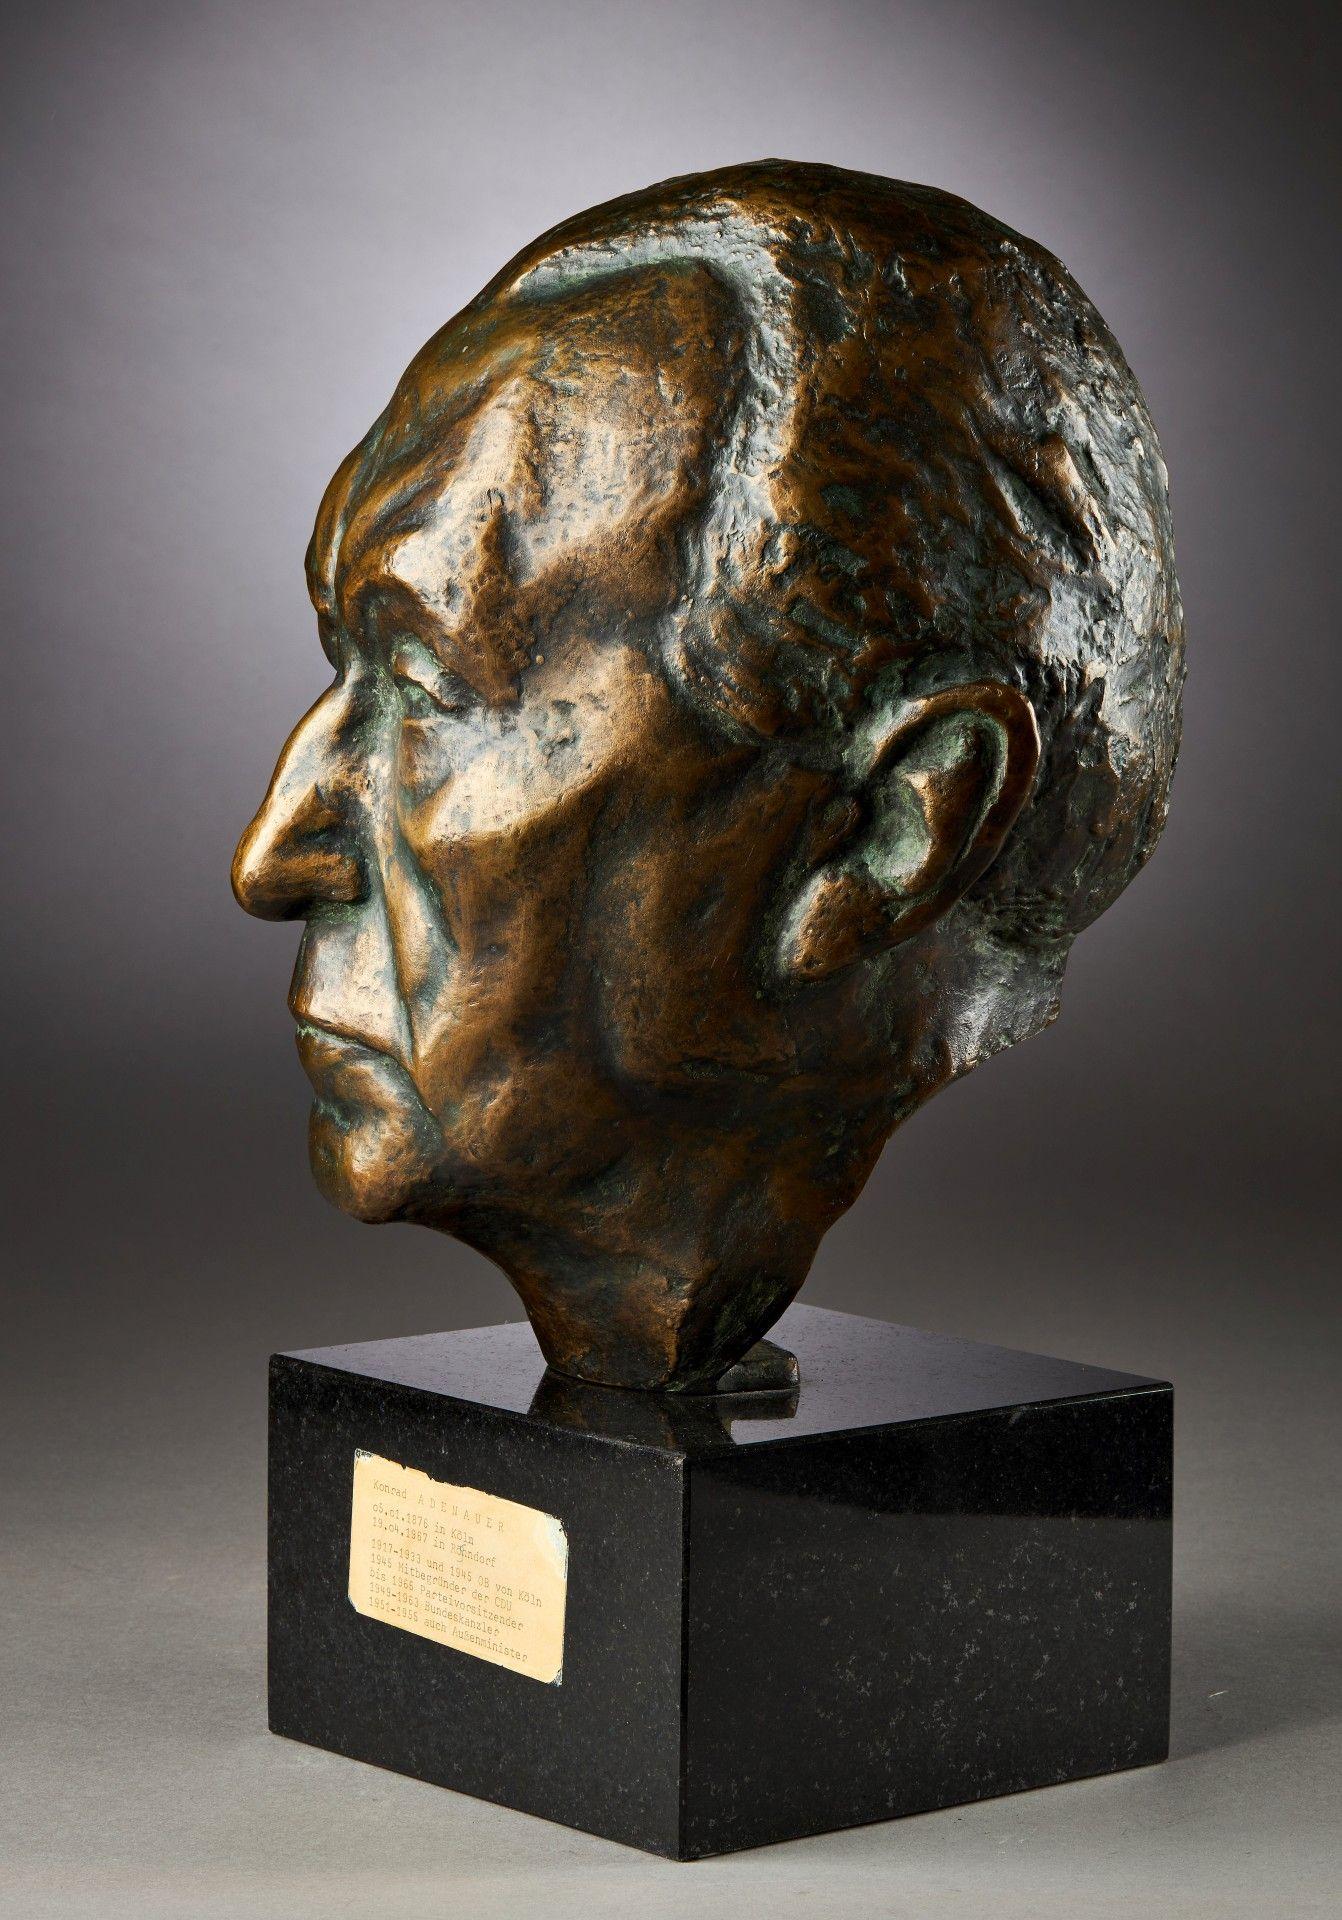 Yrsa von Leistner: Porträtbüste Konrad Adenauers. - Image 2 of 4